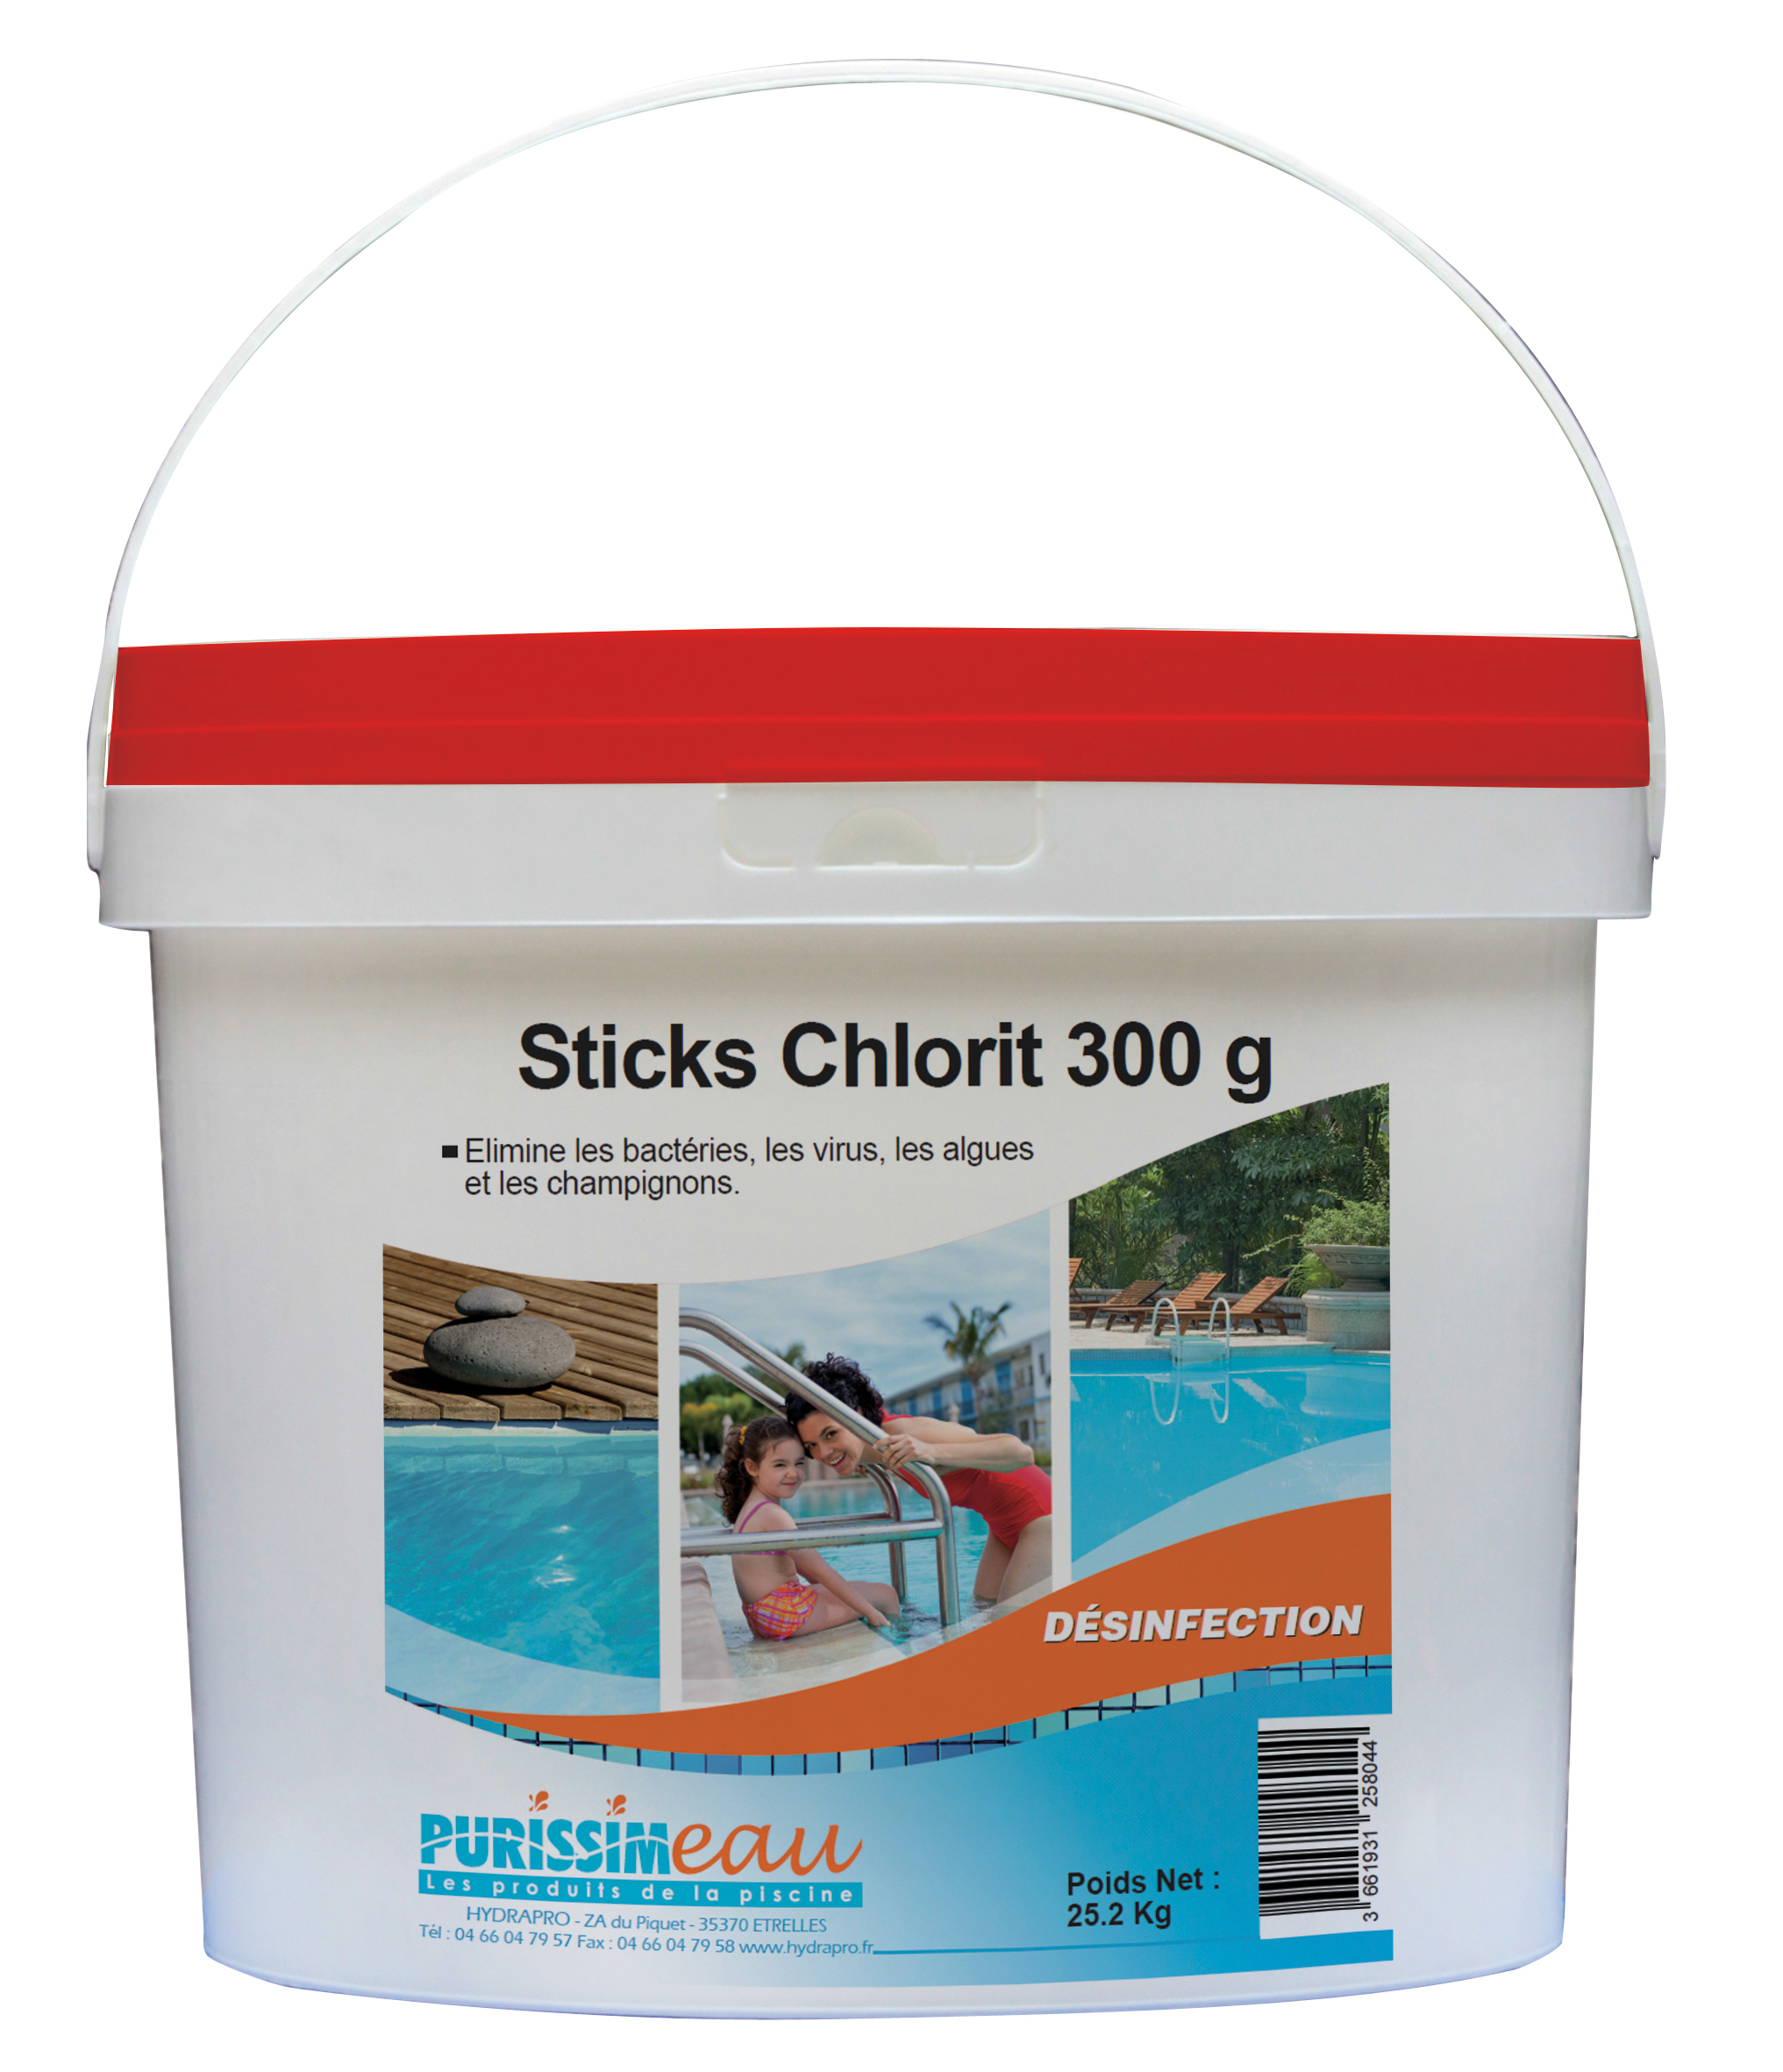 Hypochlorite de calcium piscine soldes hypochlorite de - Hypochlorite de calcium piscine ...